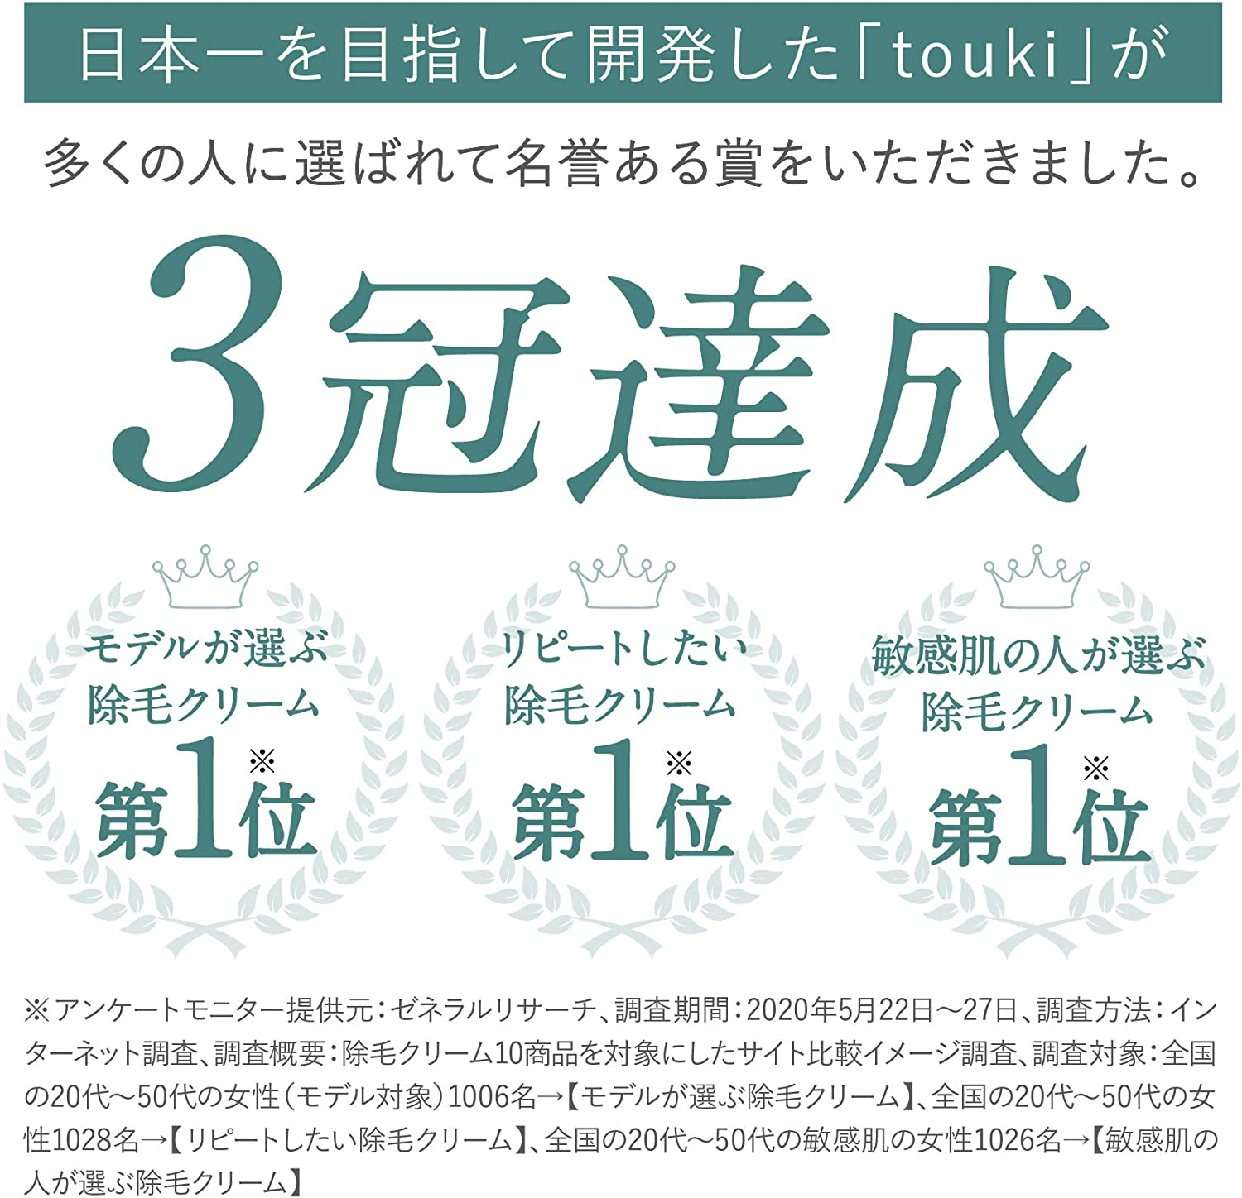 HAN.d(ハンド)toukiの商品画像2